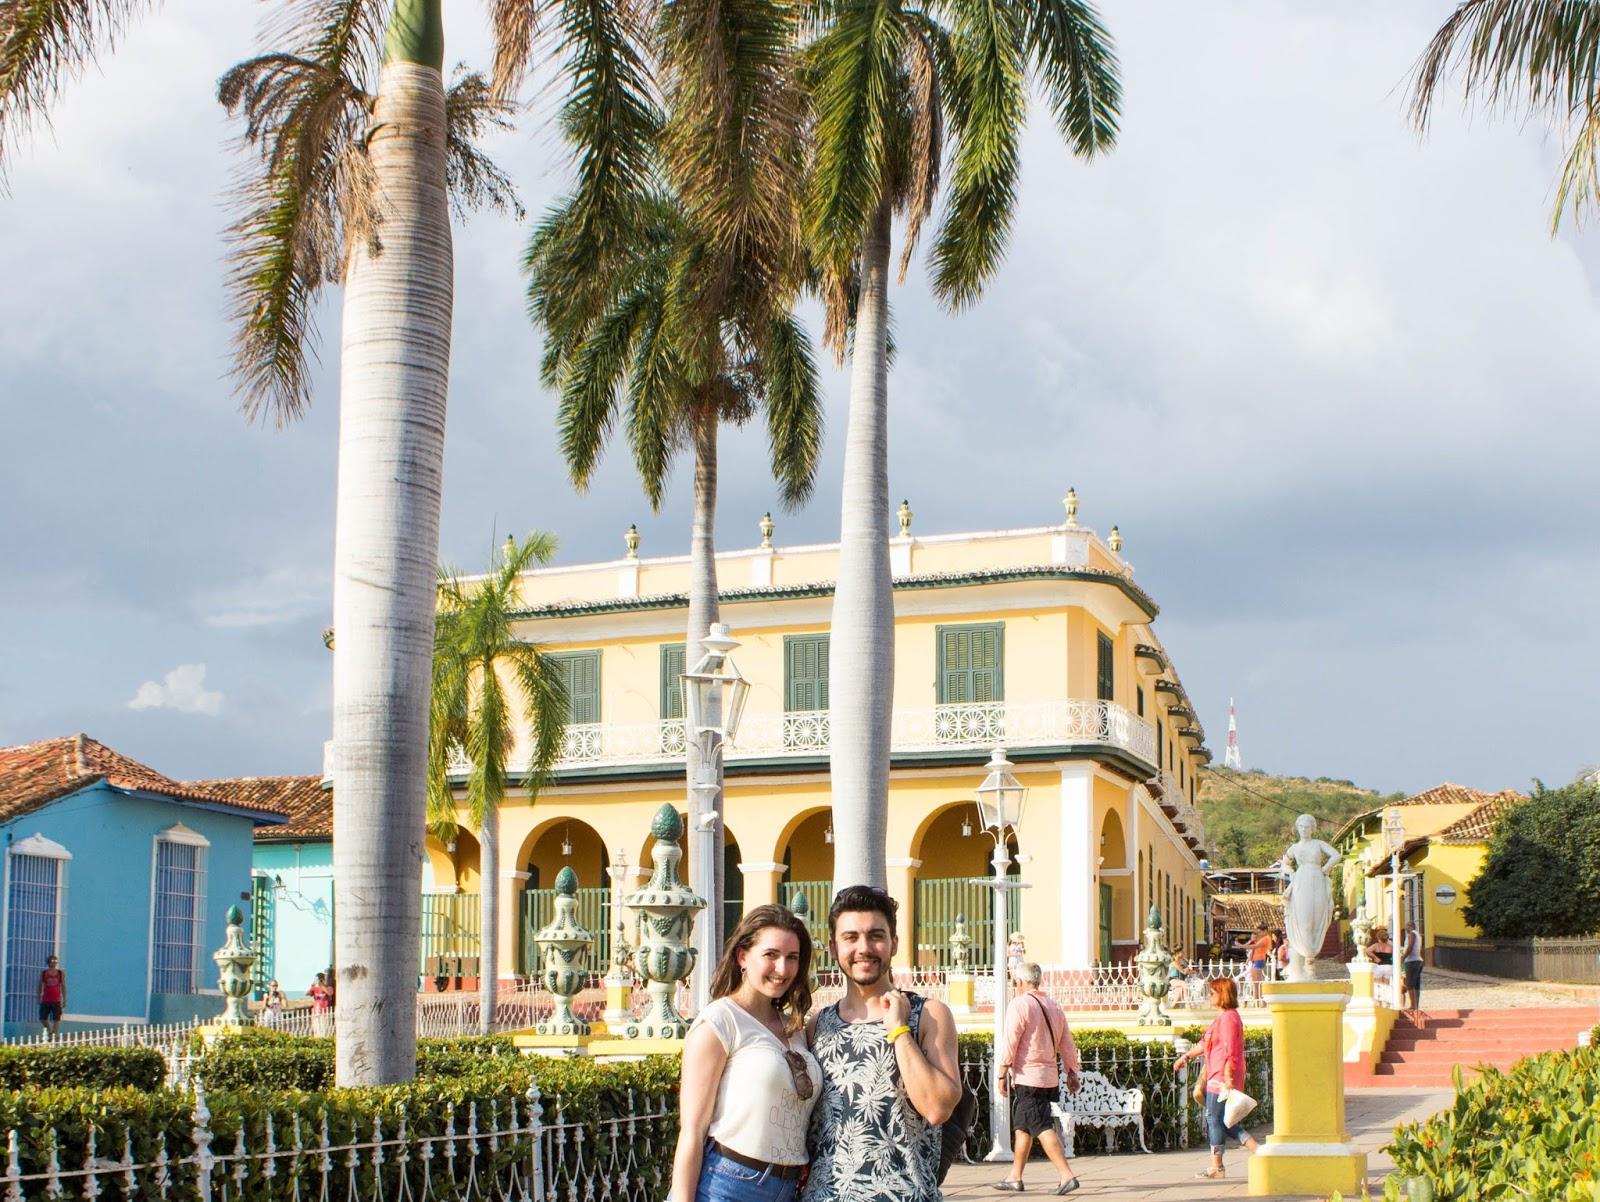 Trinidad_Cuba_Travel_Guide289a29